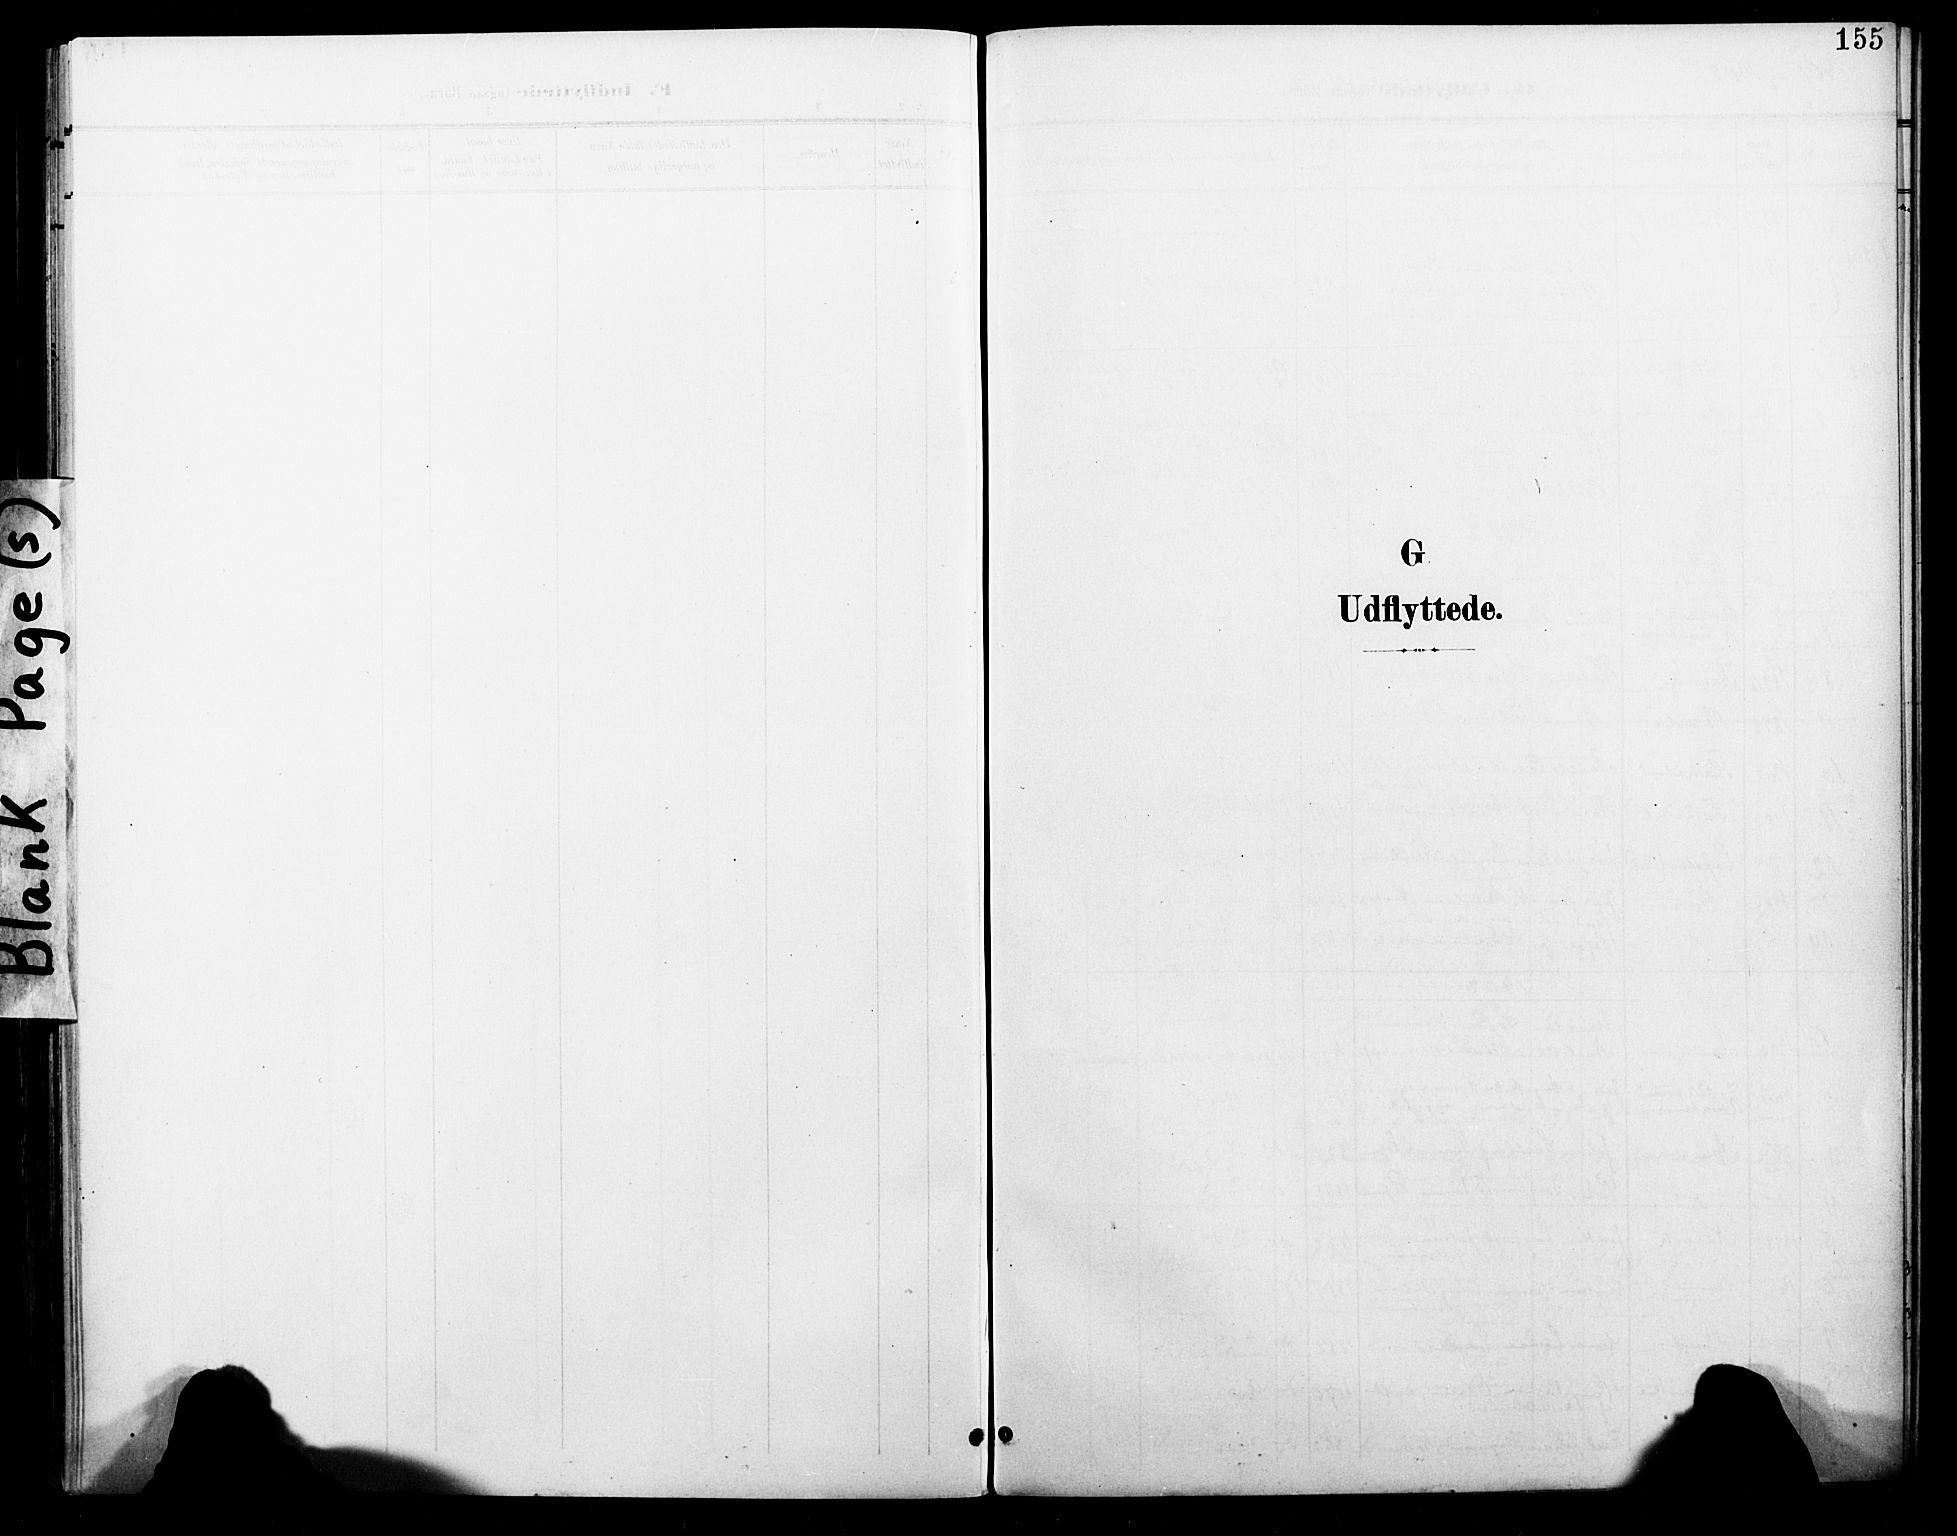 SAT, Ministerialprotokoller, klokkerbøker og fødselsregistre - Nordland, 804/L0088: Klokkerbok nr. 804C01, 1901-1917, s. 155